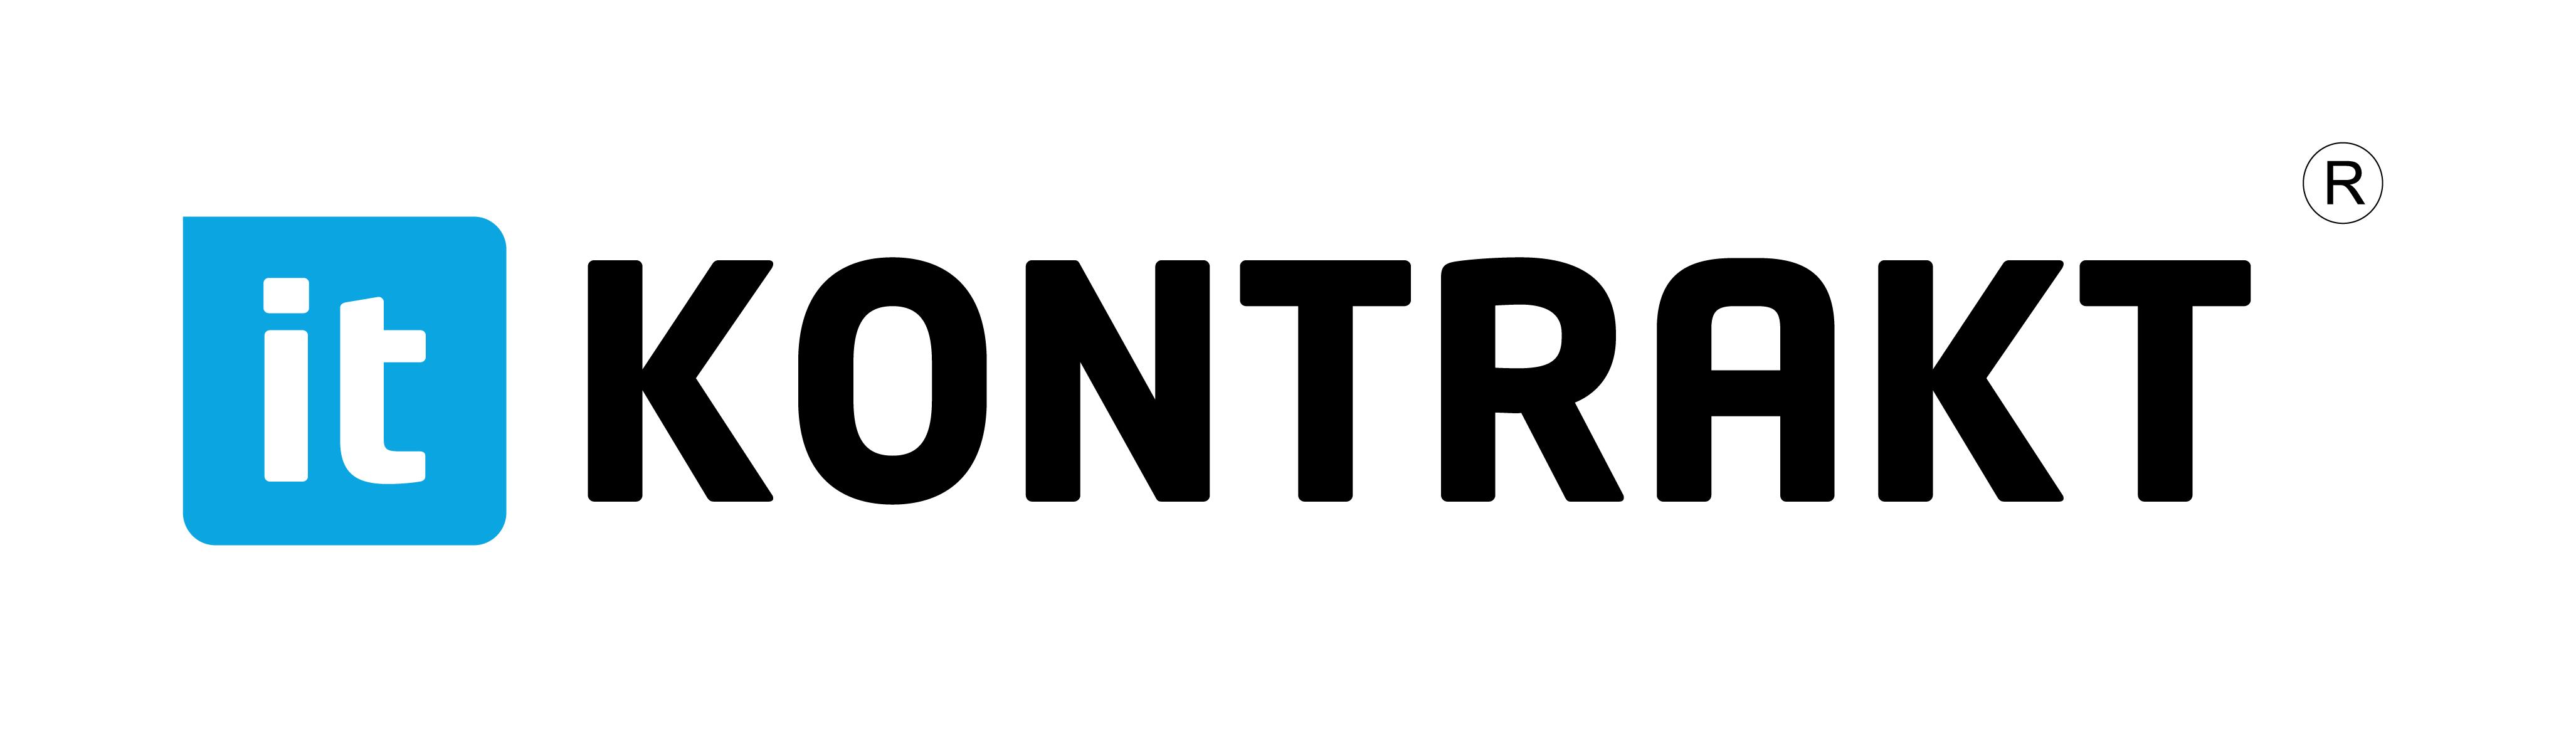 it KONTRAKT